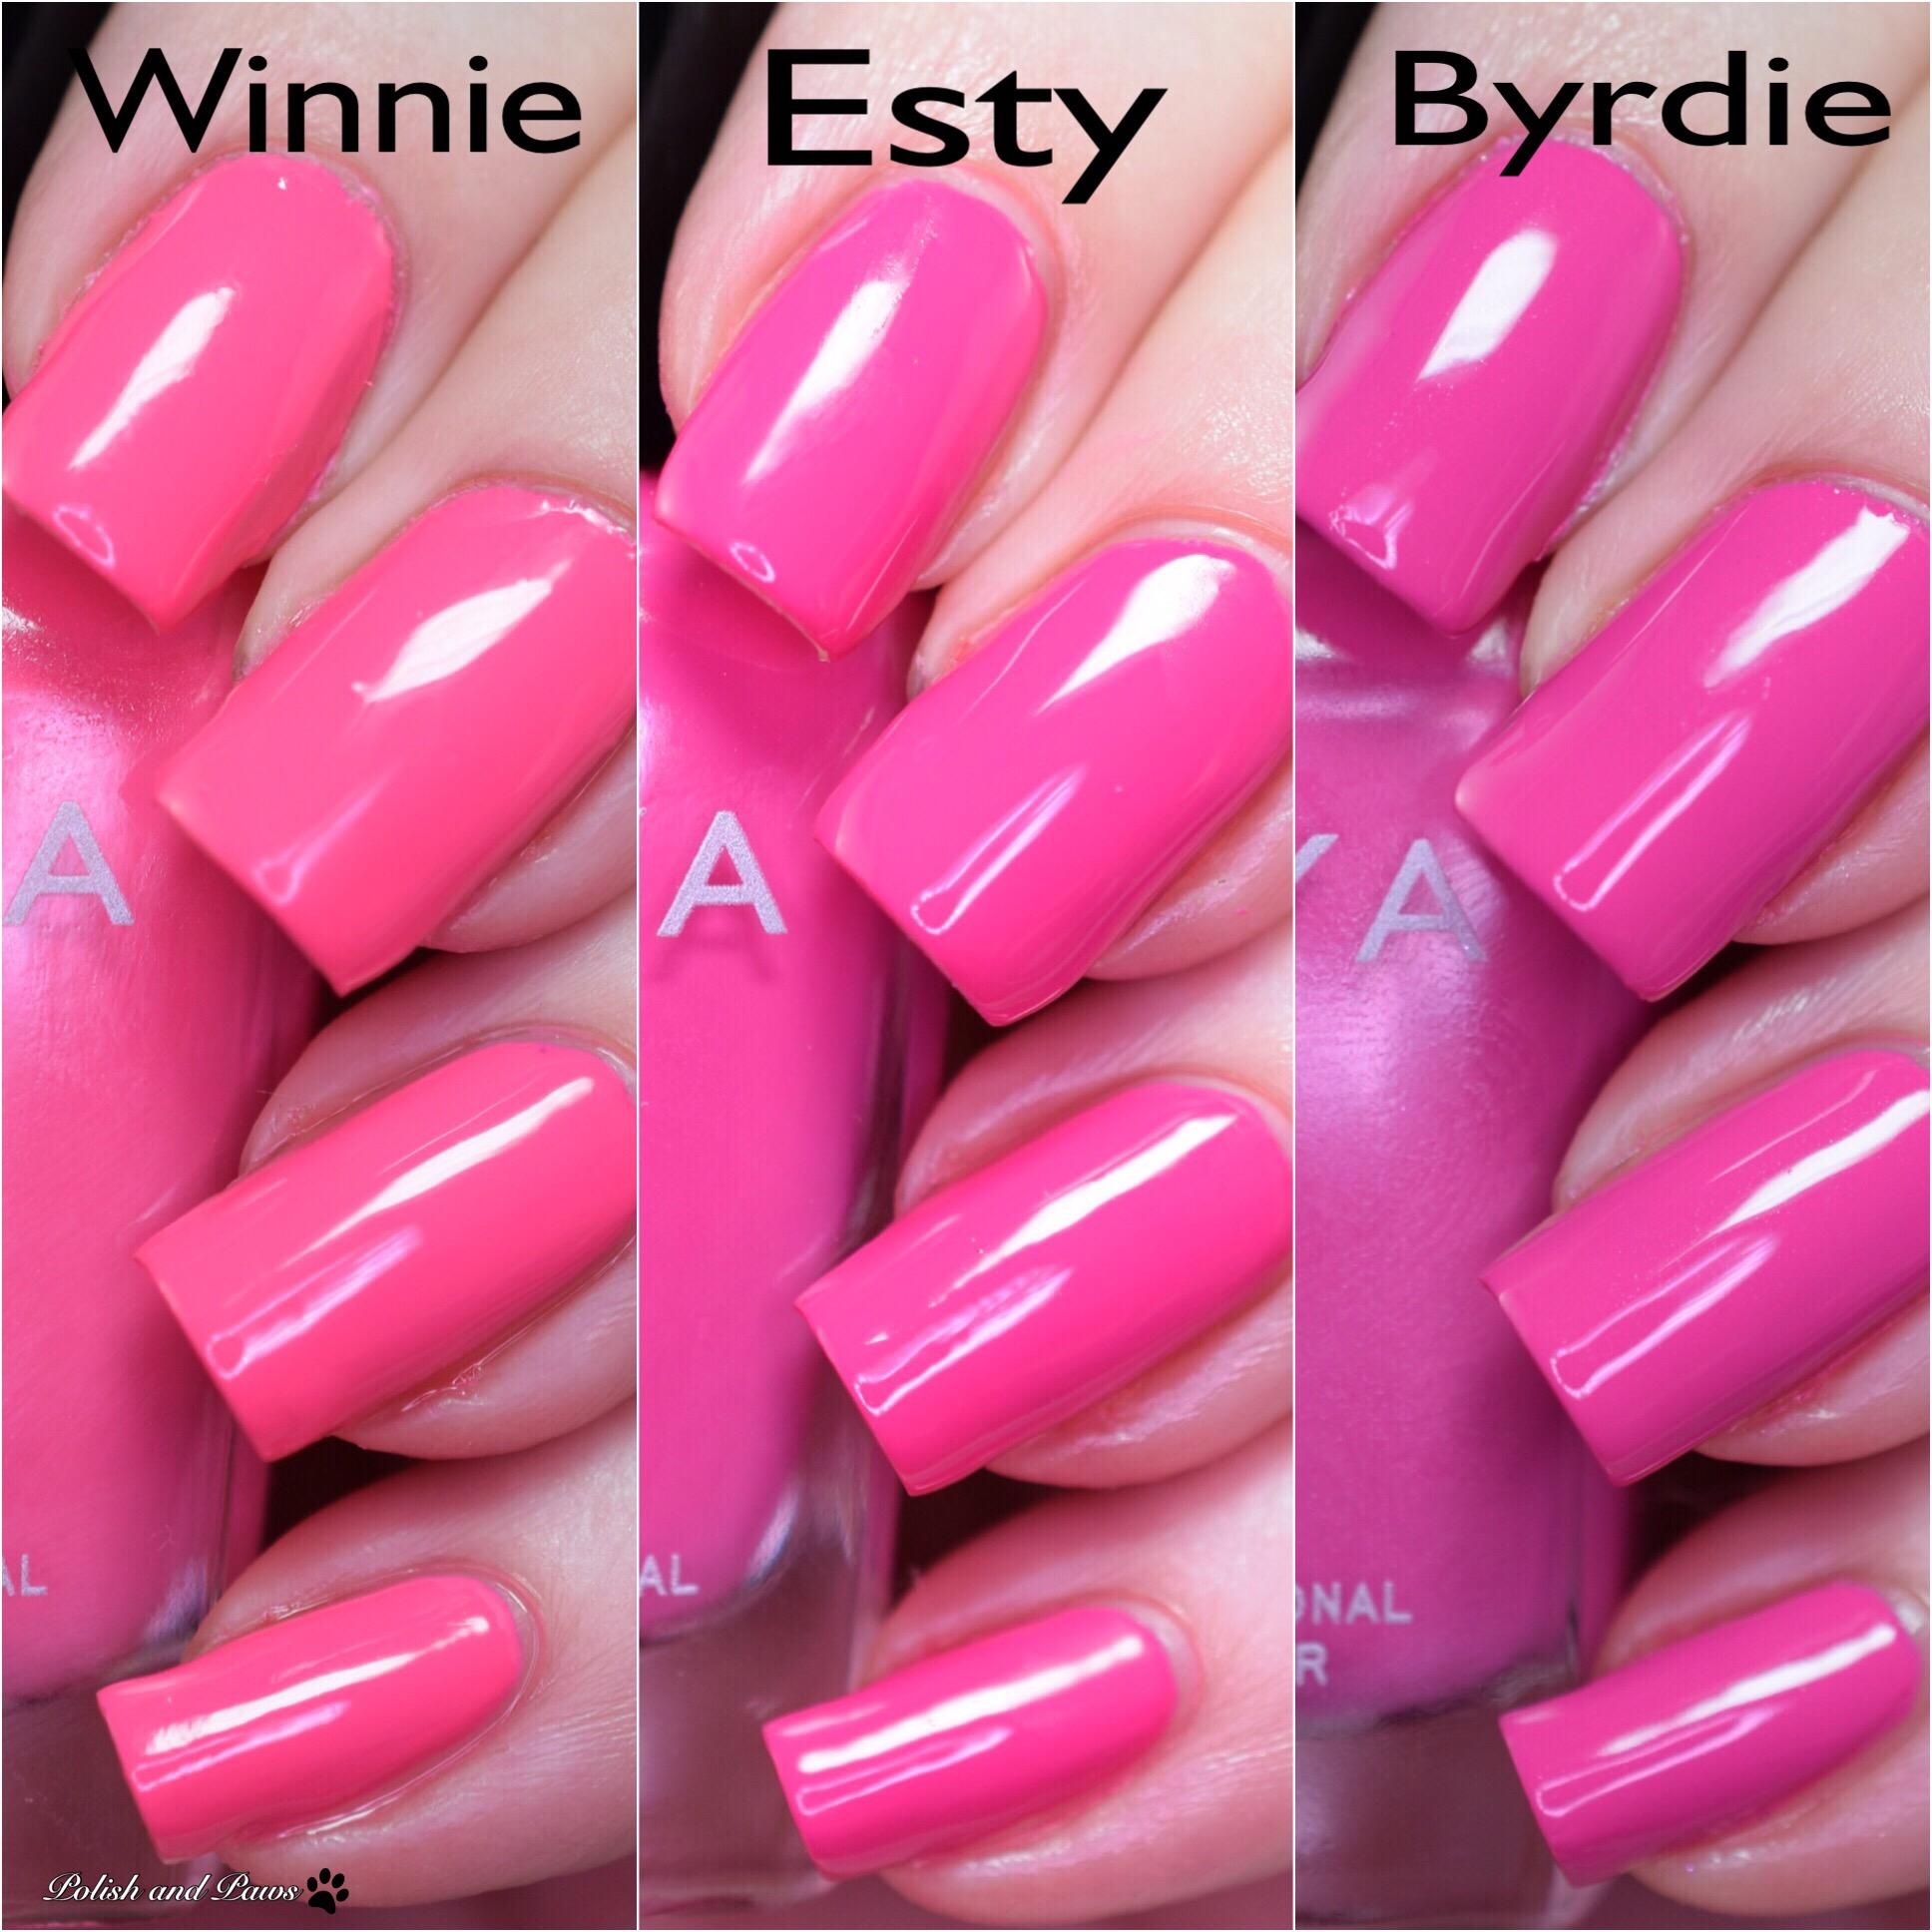 Zoya Winnie vs Esty vs Byrdie